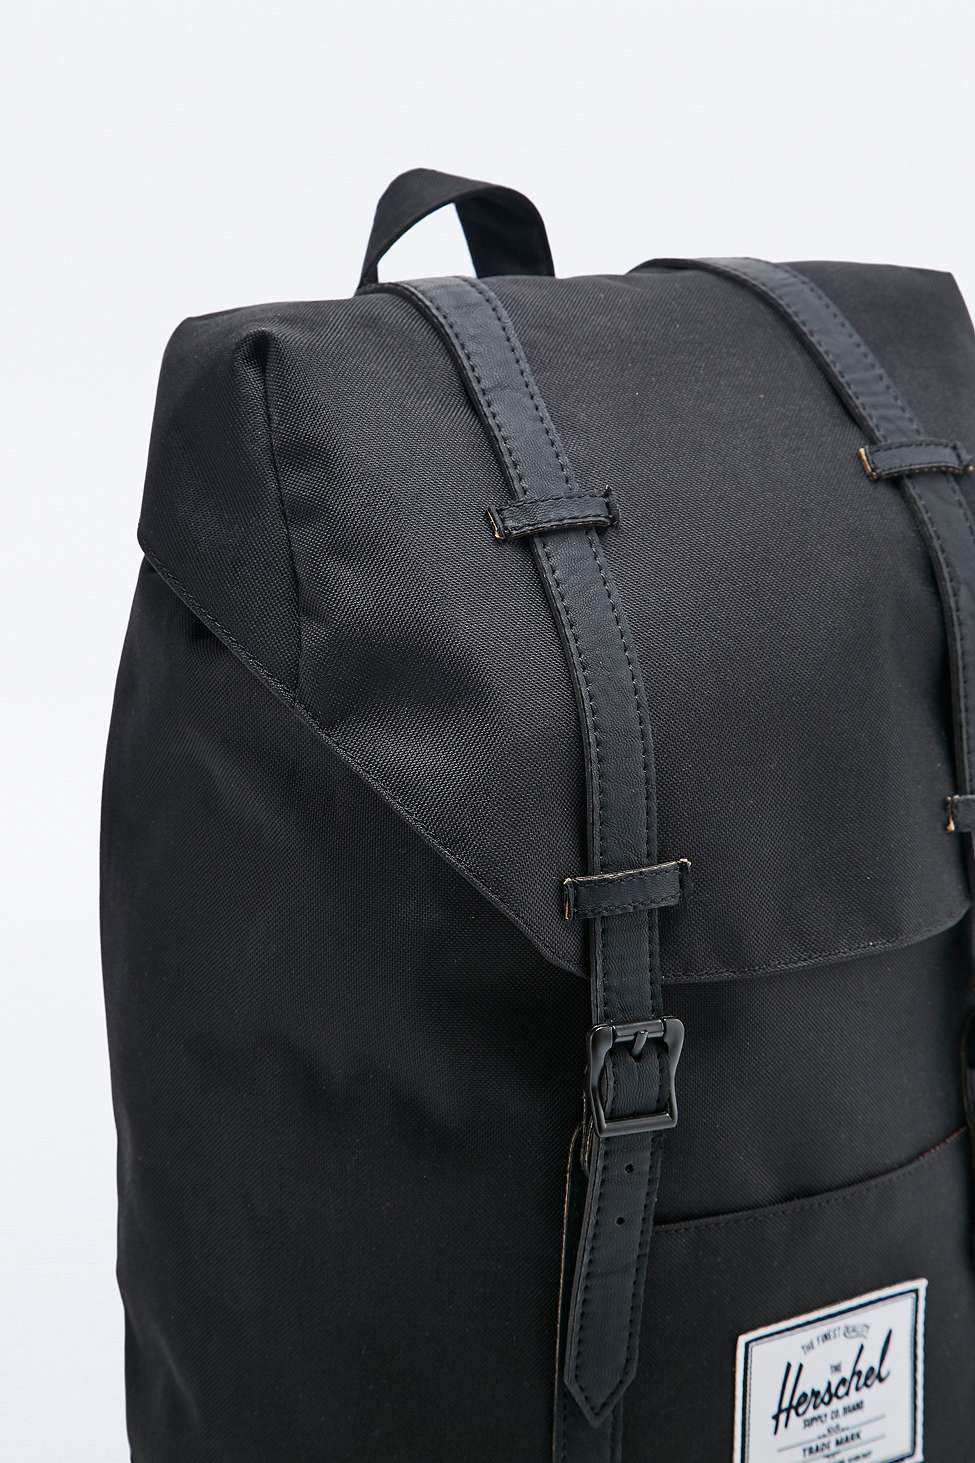 Herschel Supply Co. Retreat Black Backpack in Black - Lyst 3c8f8e15bd5bc